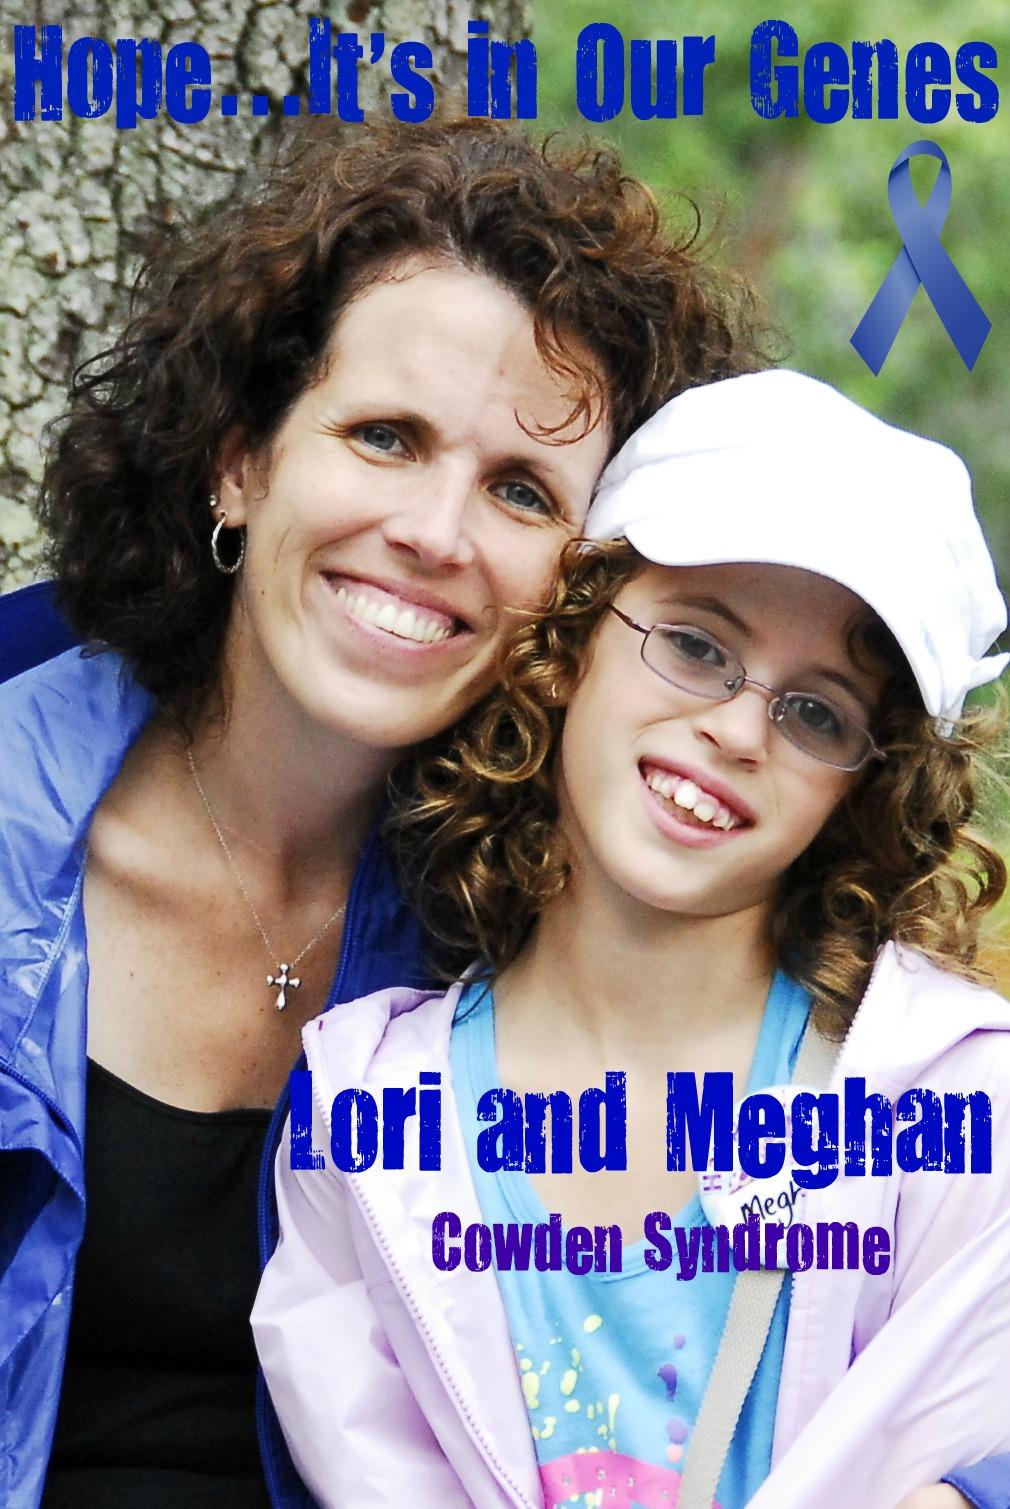 lori and meghan